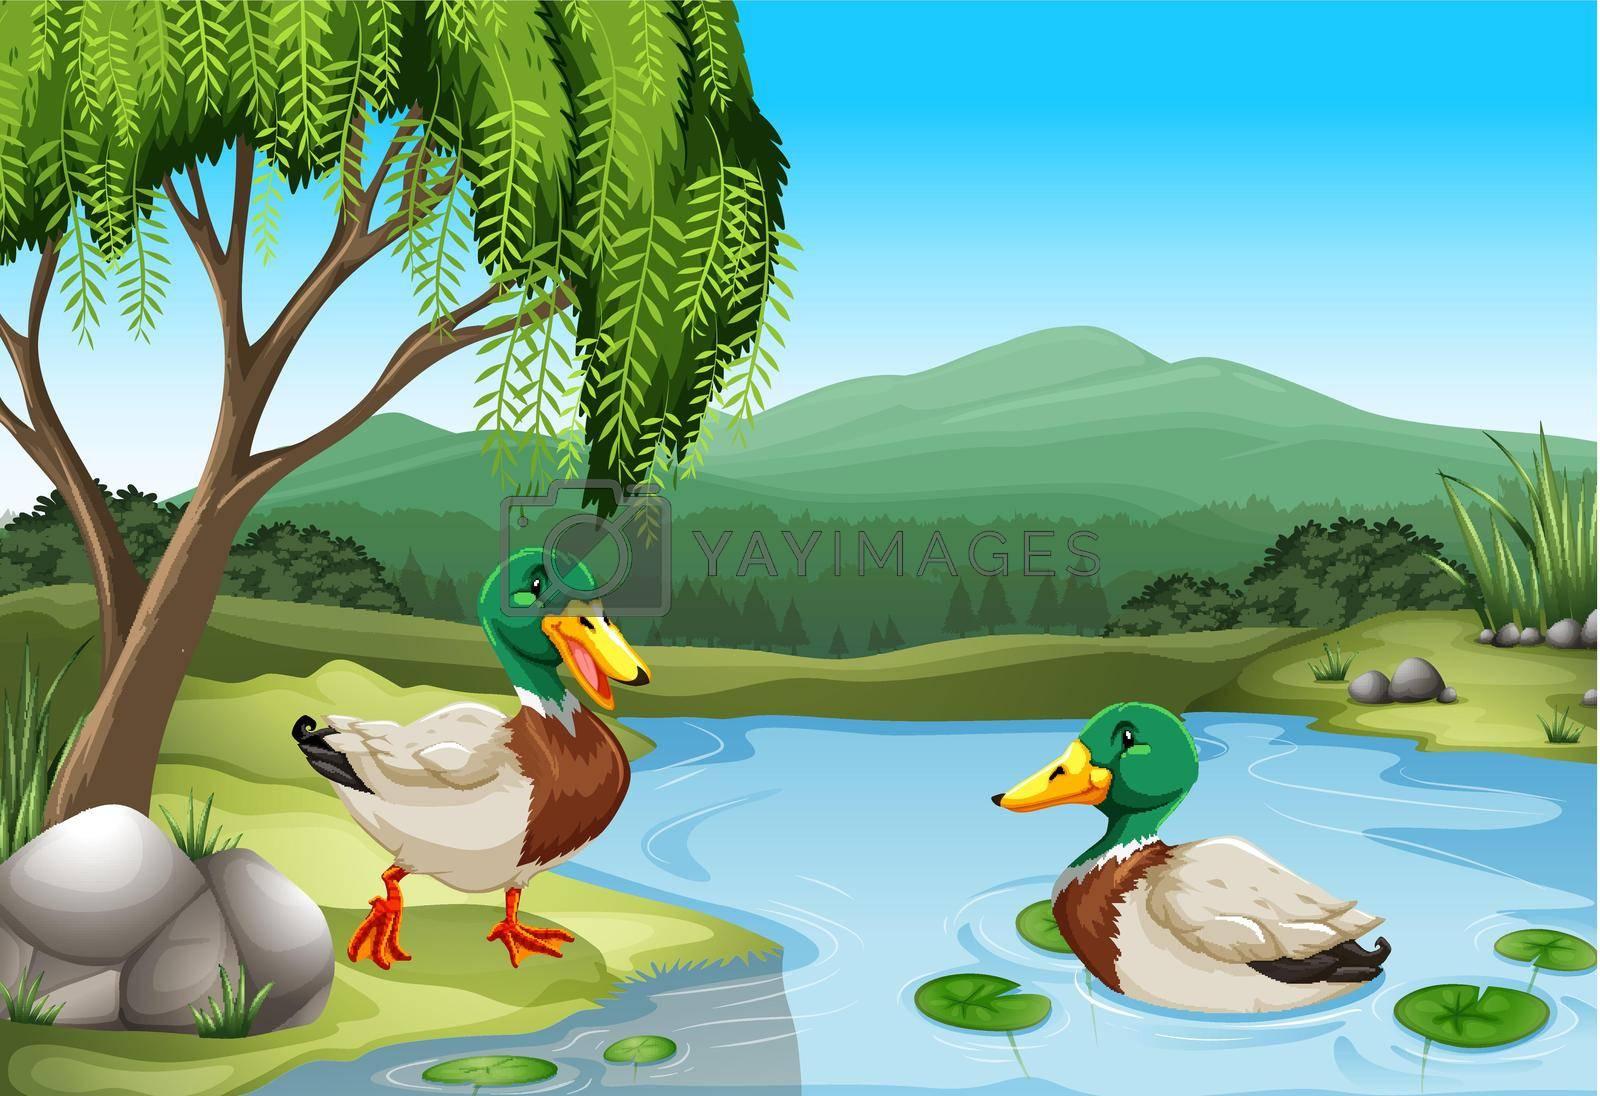 Royalty free image of Ducks by iimages